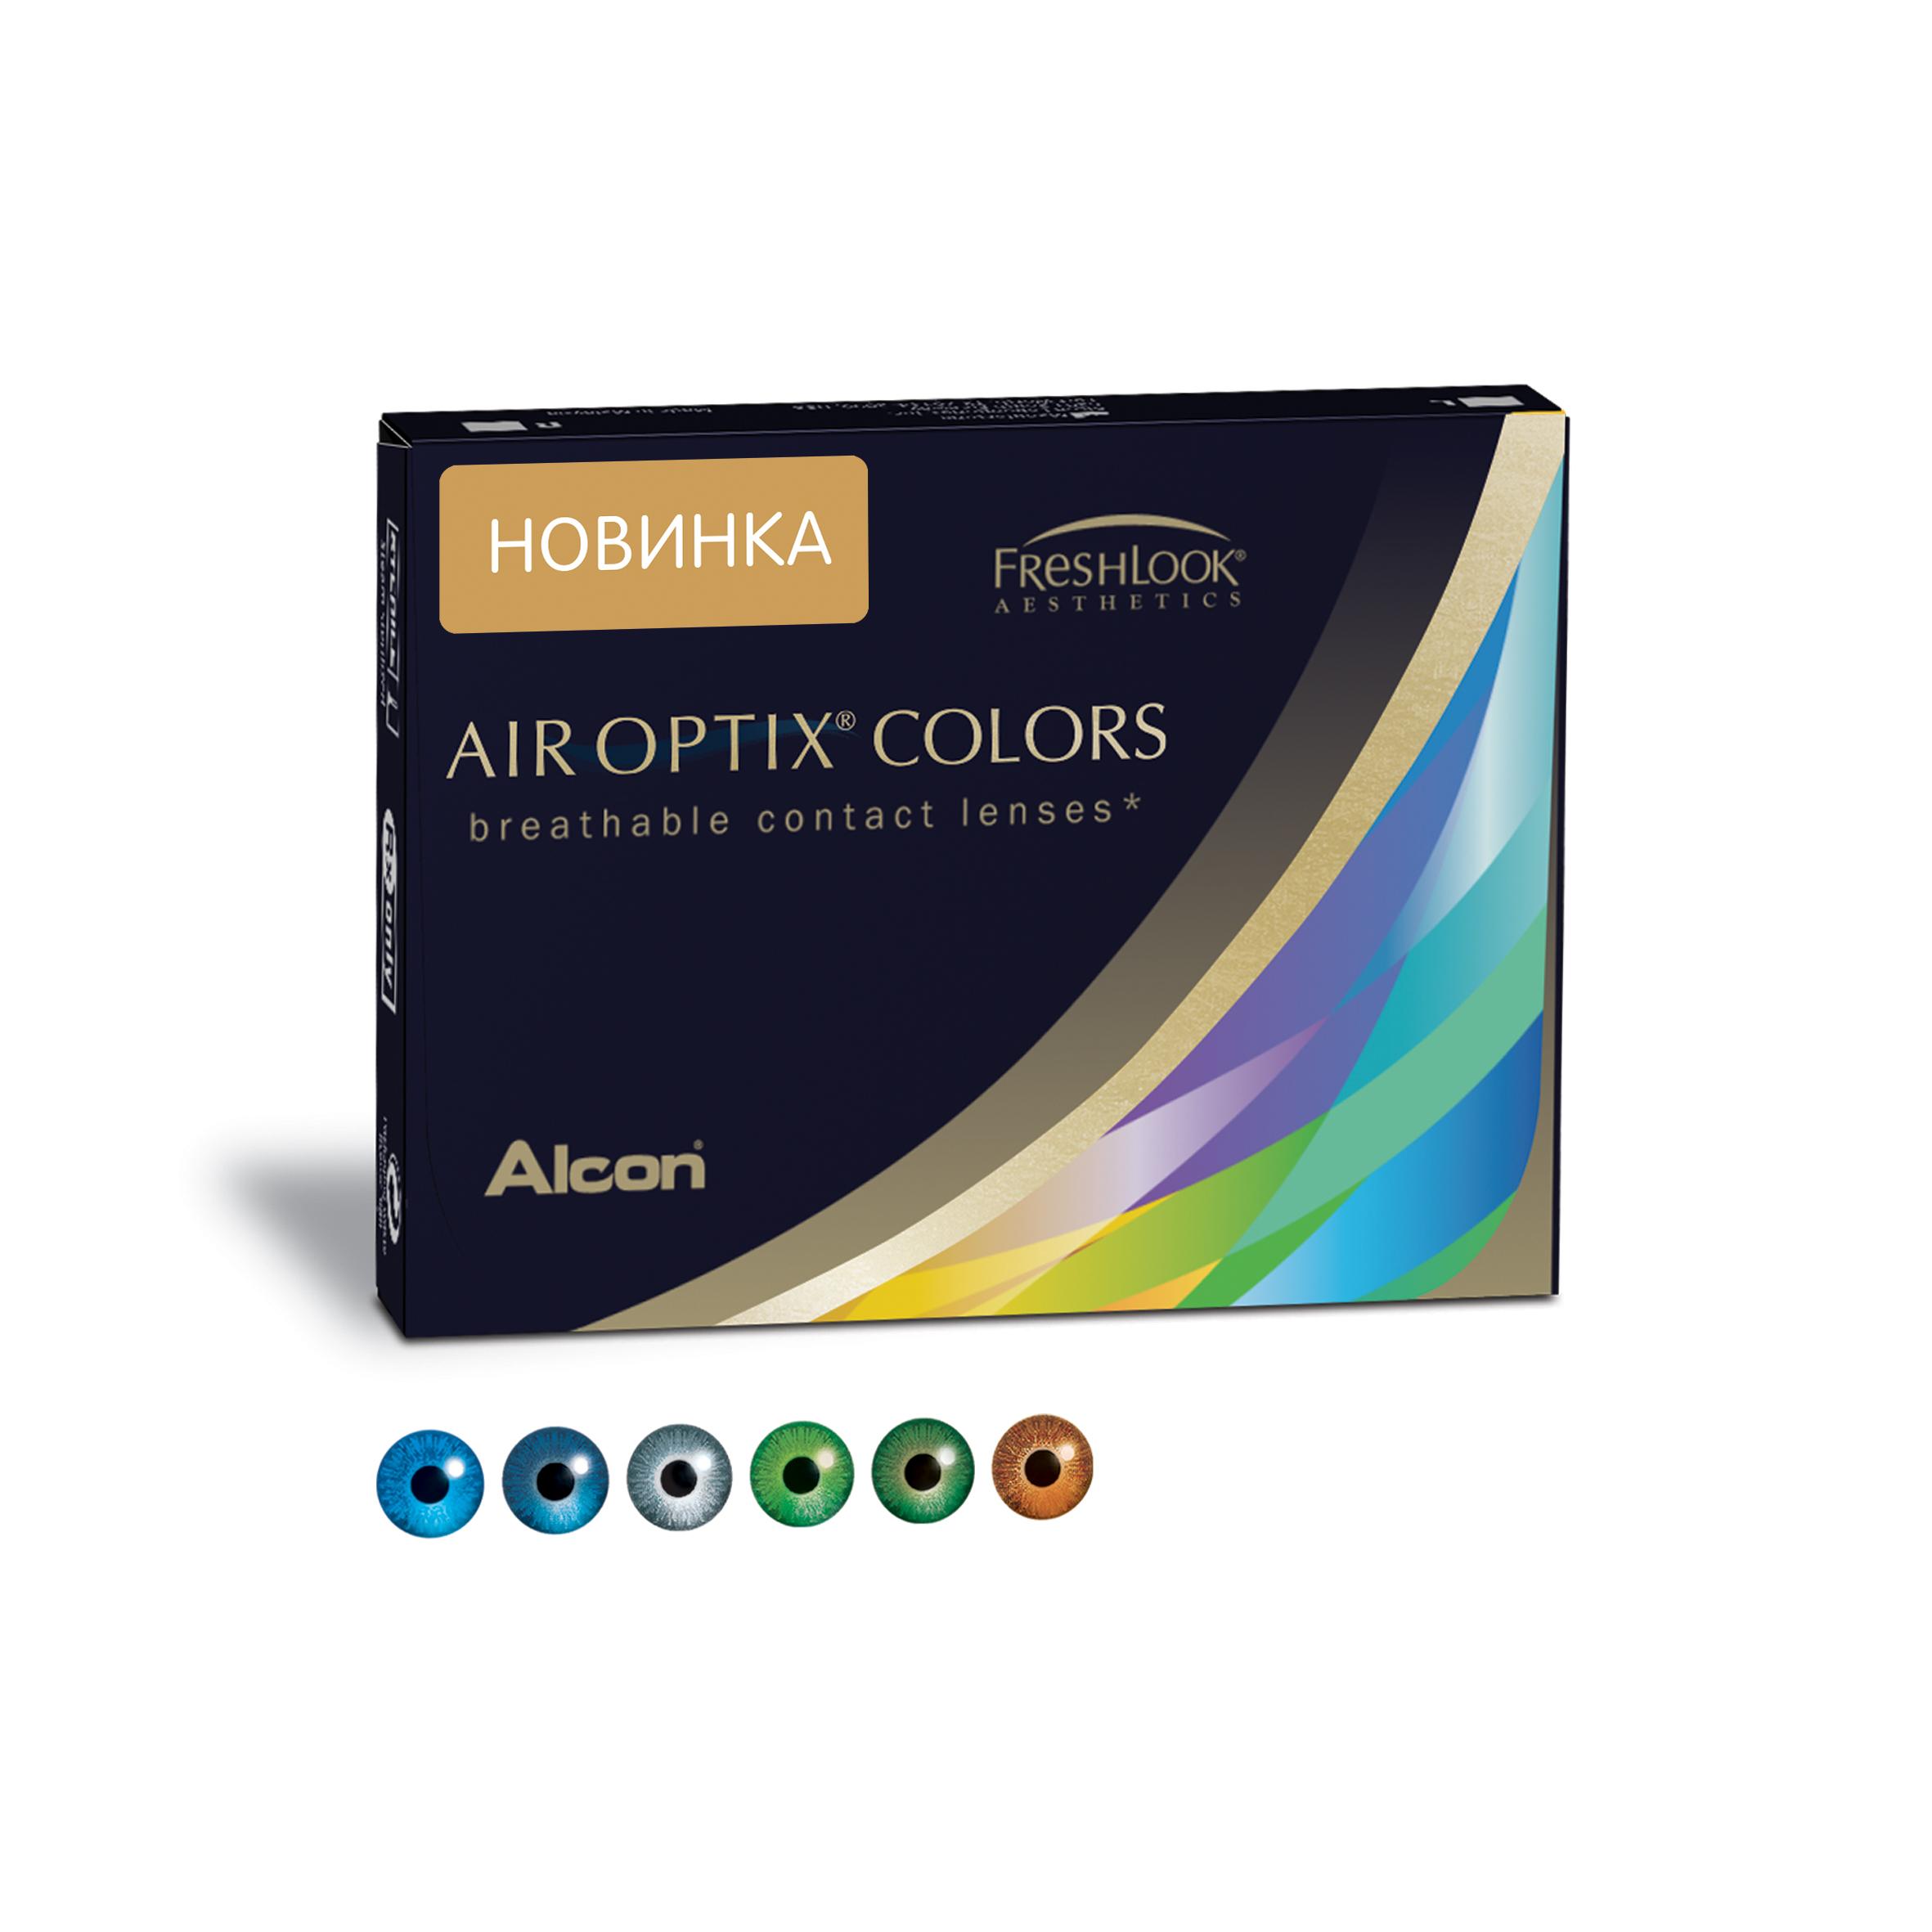 Аlcon контактные линзы Air Optix Colors 2 шт -4.25 Gemstone Green31746241Мягкие контактные линзы